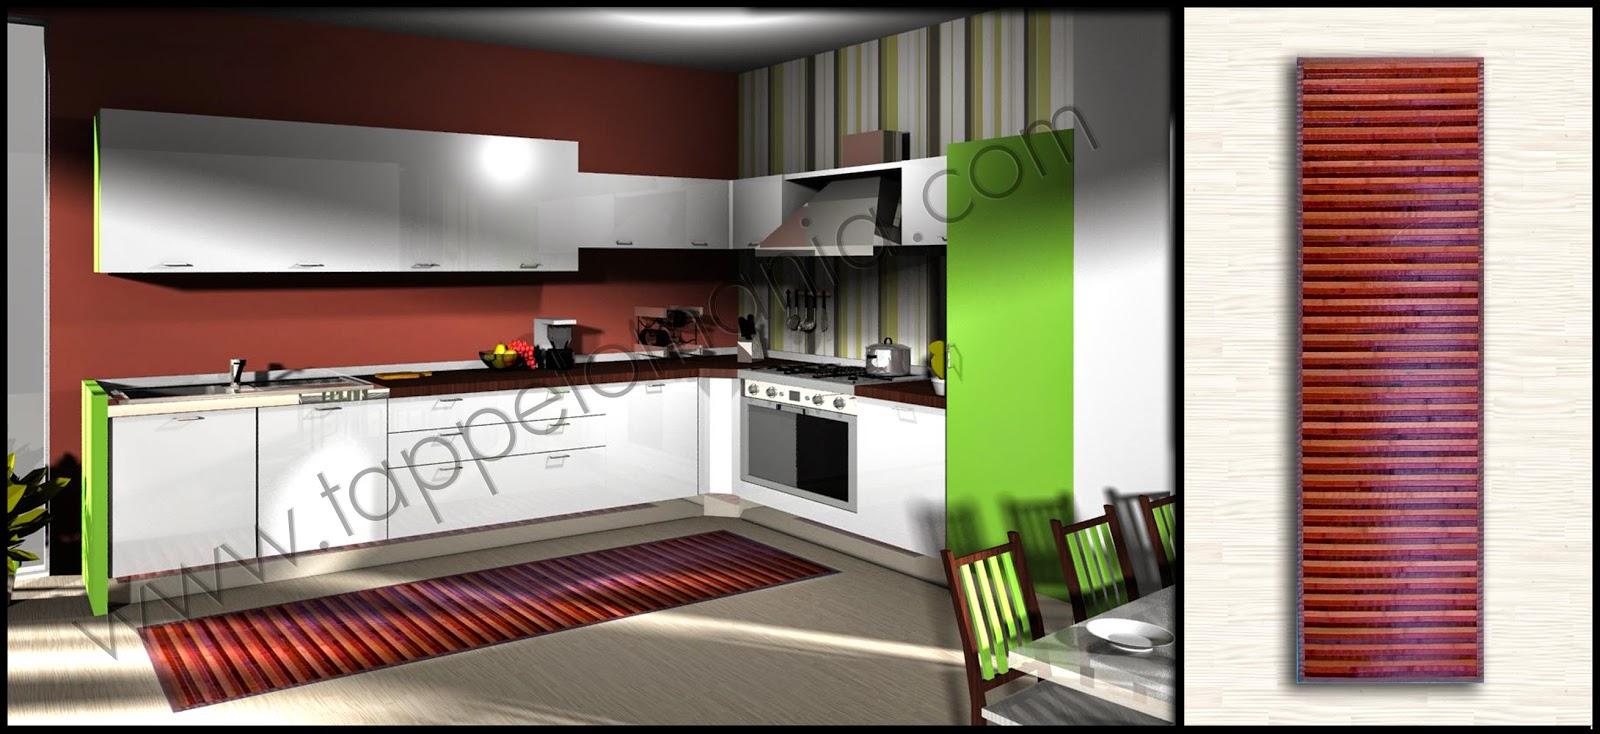 Tappeti bagno cucina in bamboo tappetomania - Tappeti per cucina ...